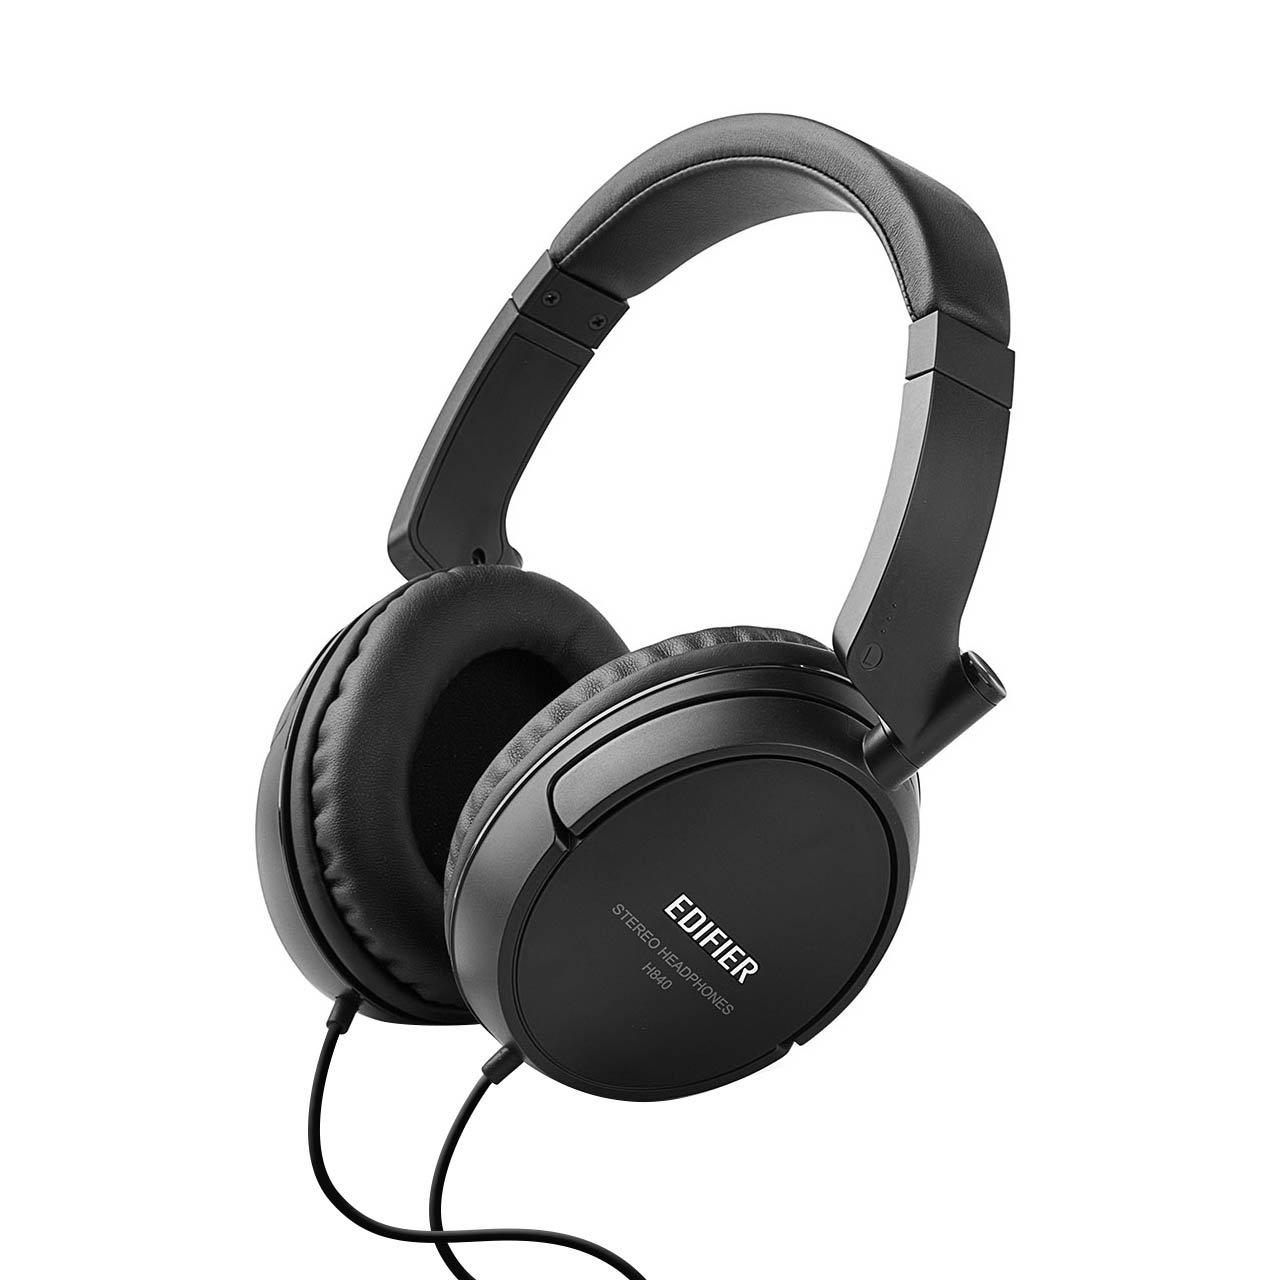 Edifier Audiophile Over-the-ear Headphones